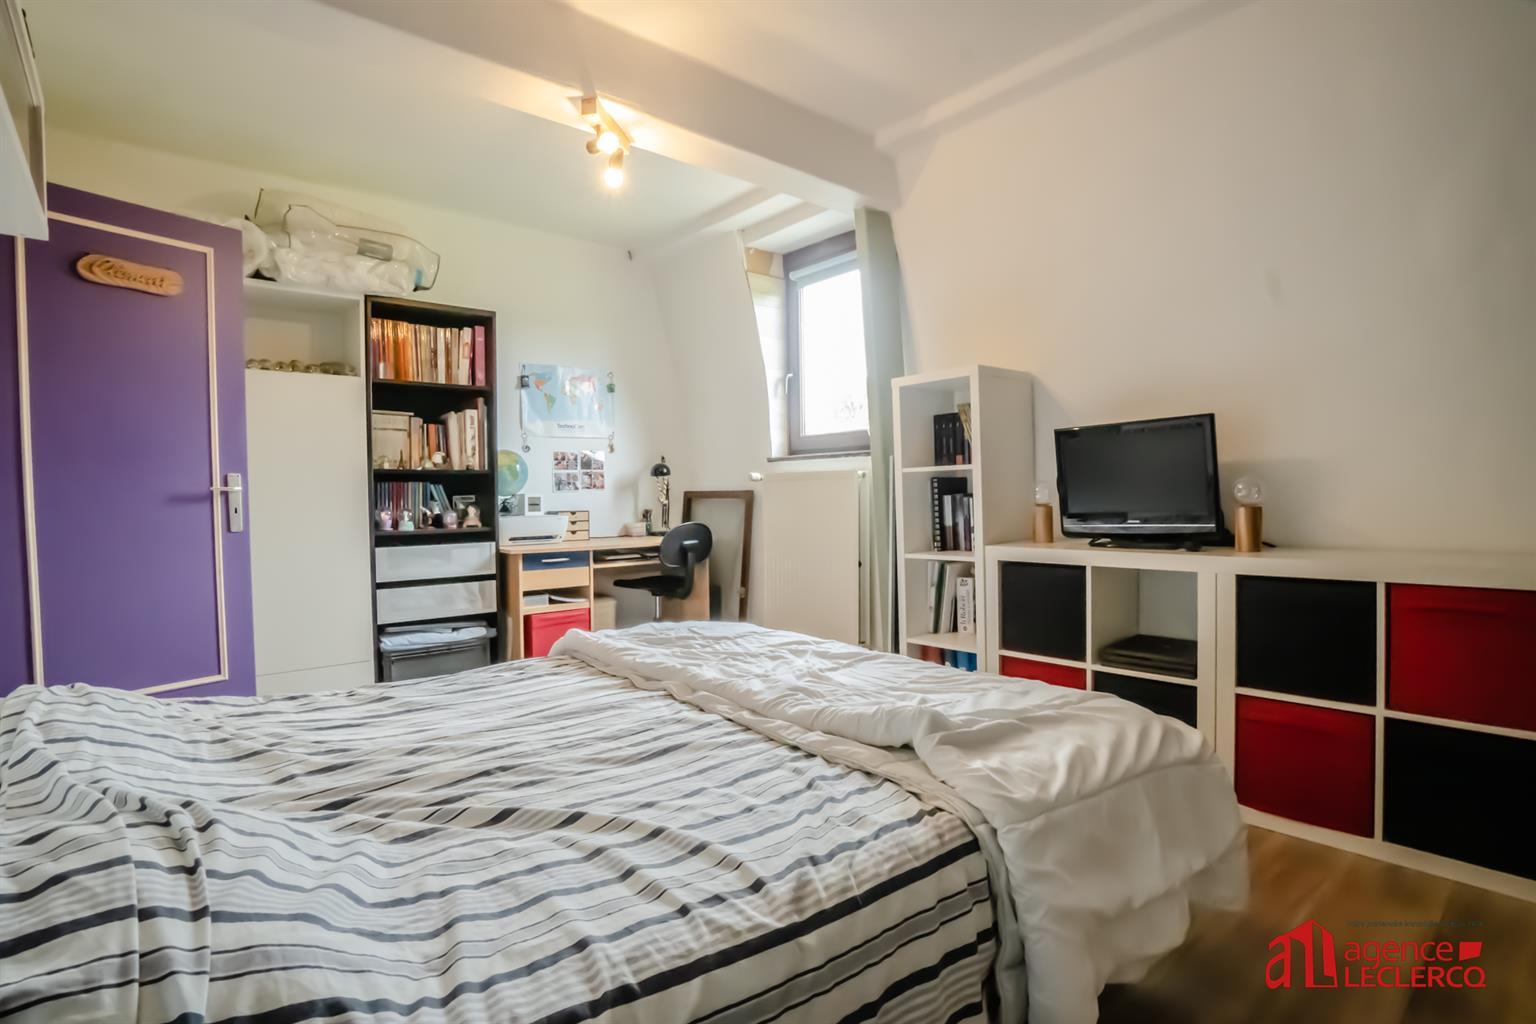 Maison - Gaurain-Ramecroix - #4408184-17